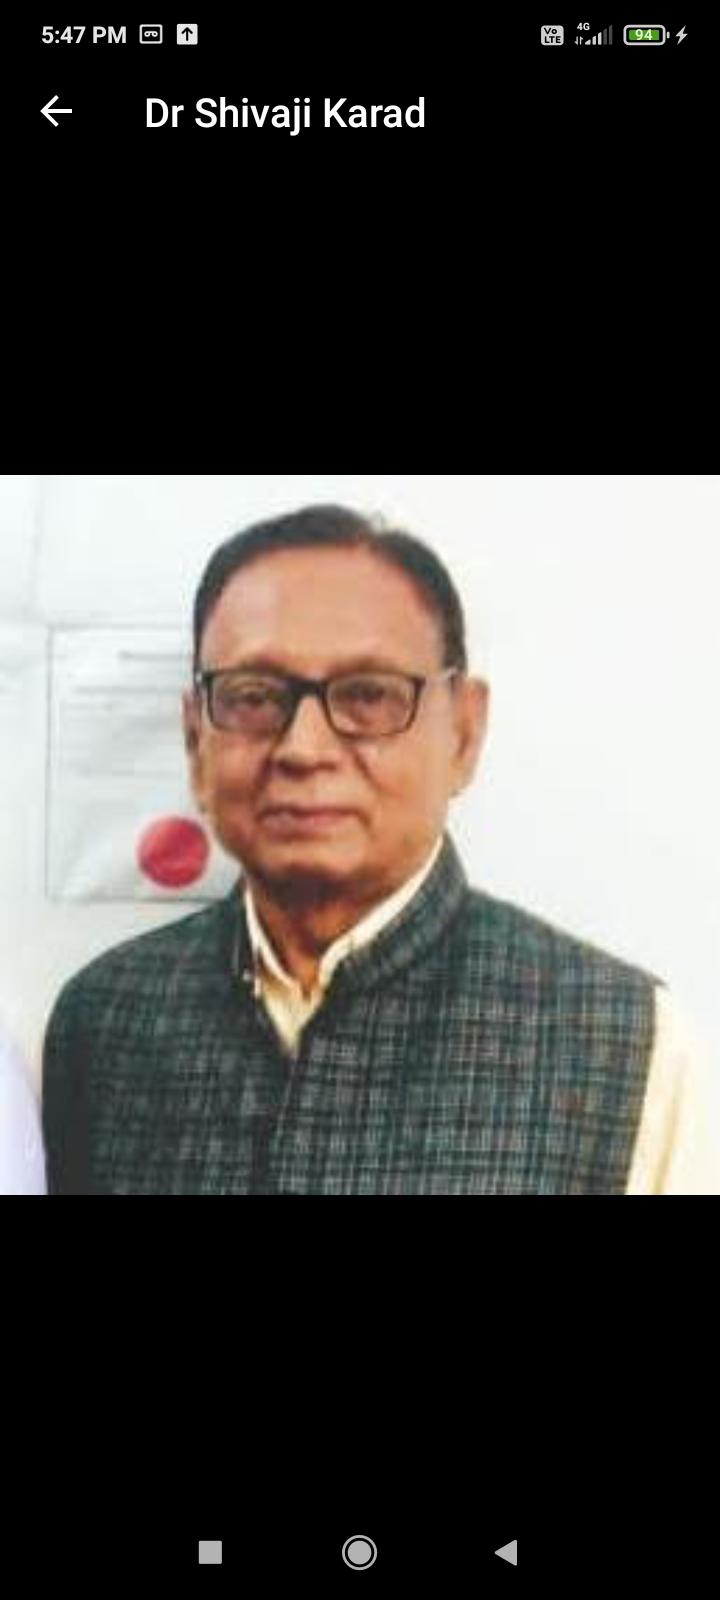 Dr. Shivaji Karad